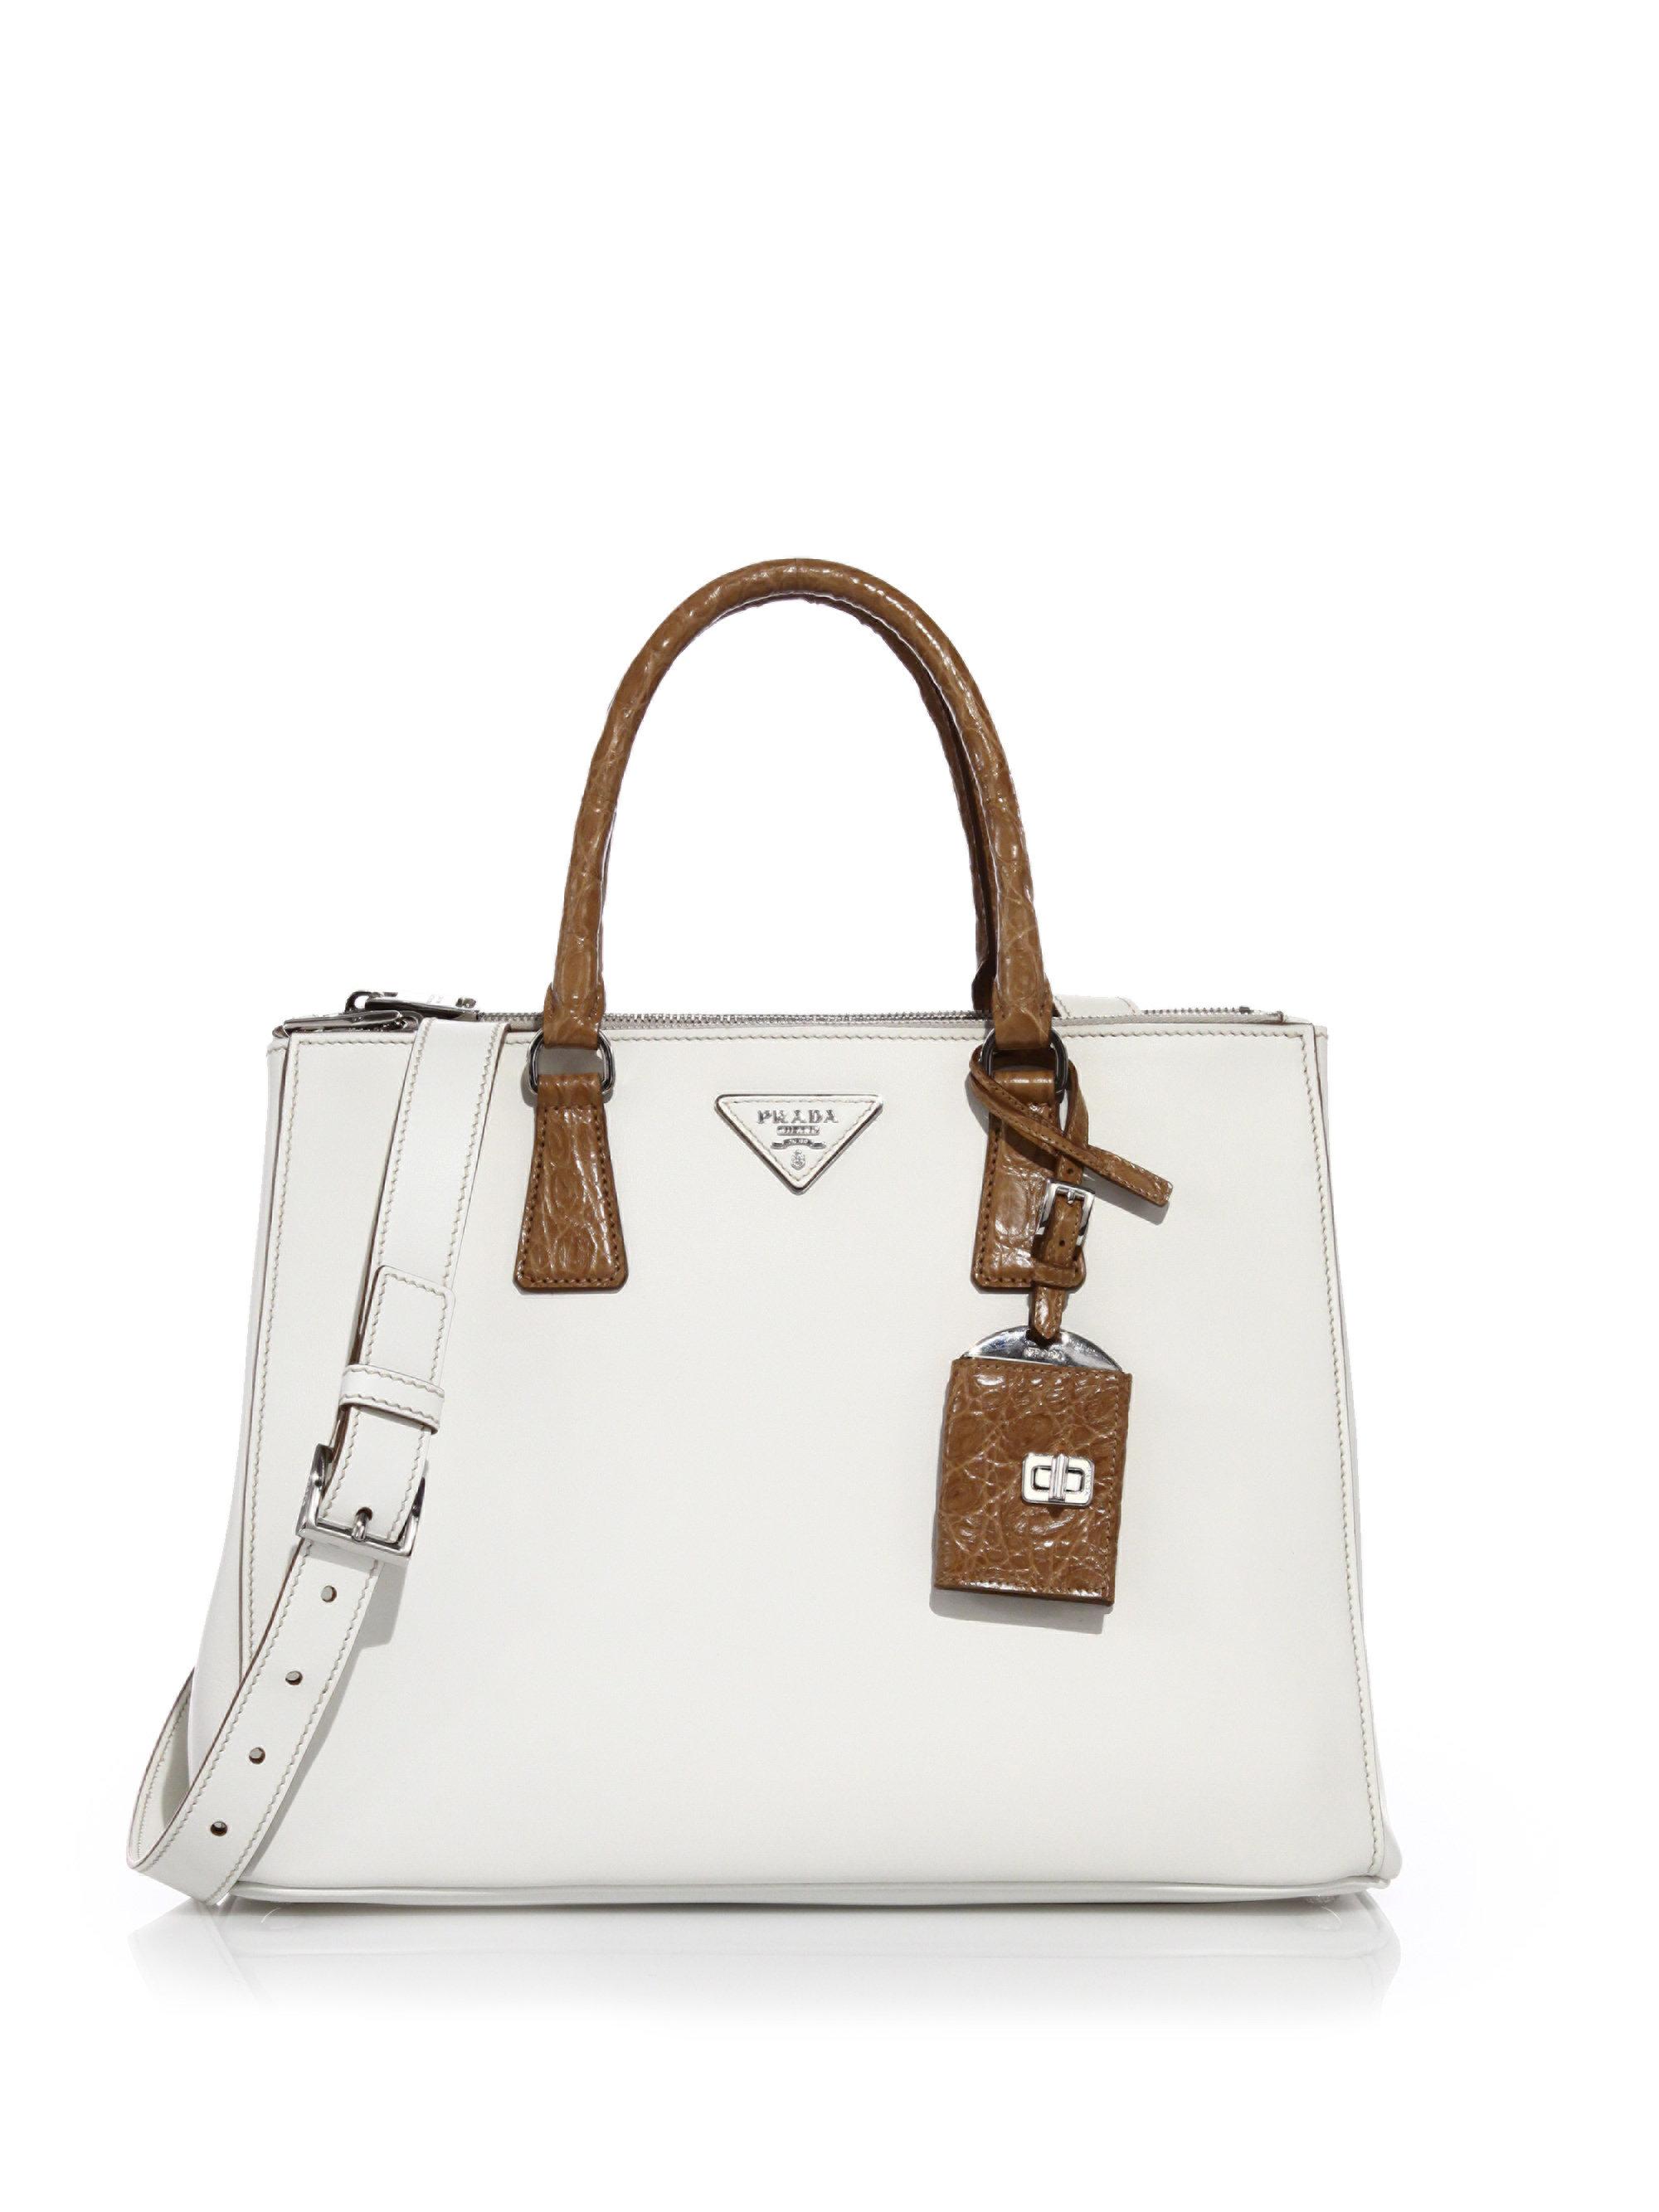 41abe39327a9 ... cheapest lyst prada galleria medium leather and crocodile tote in white  c0be3 fa018